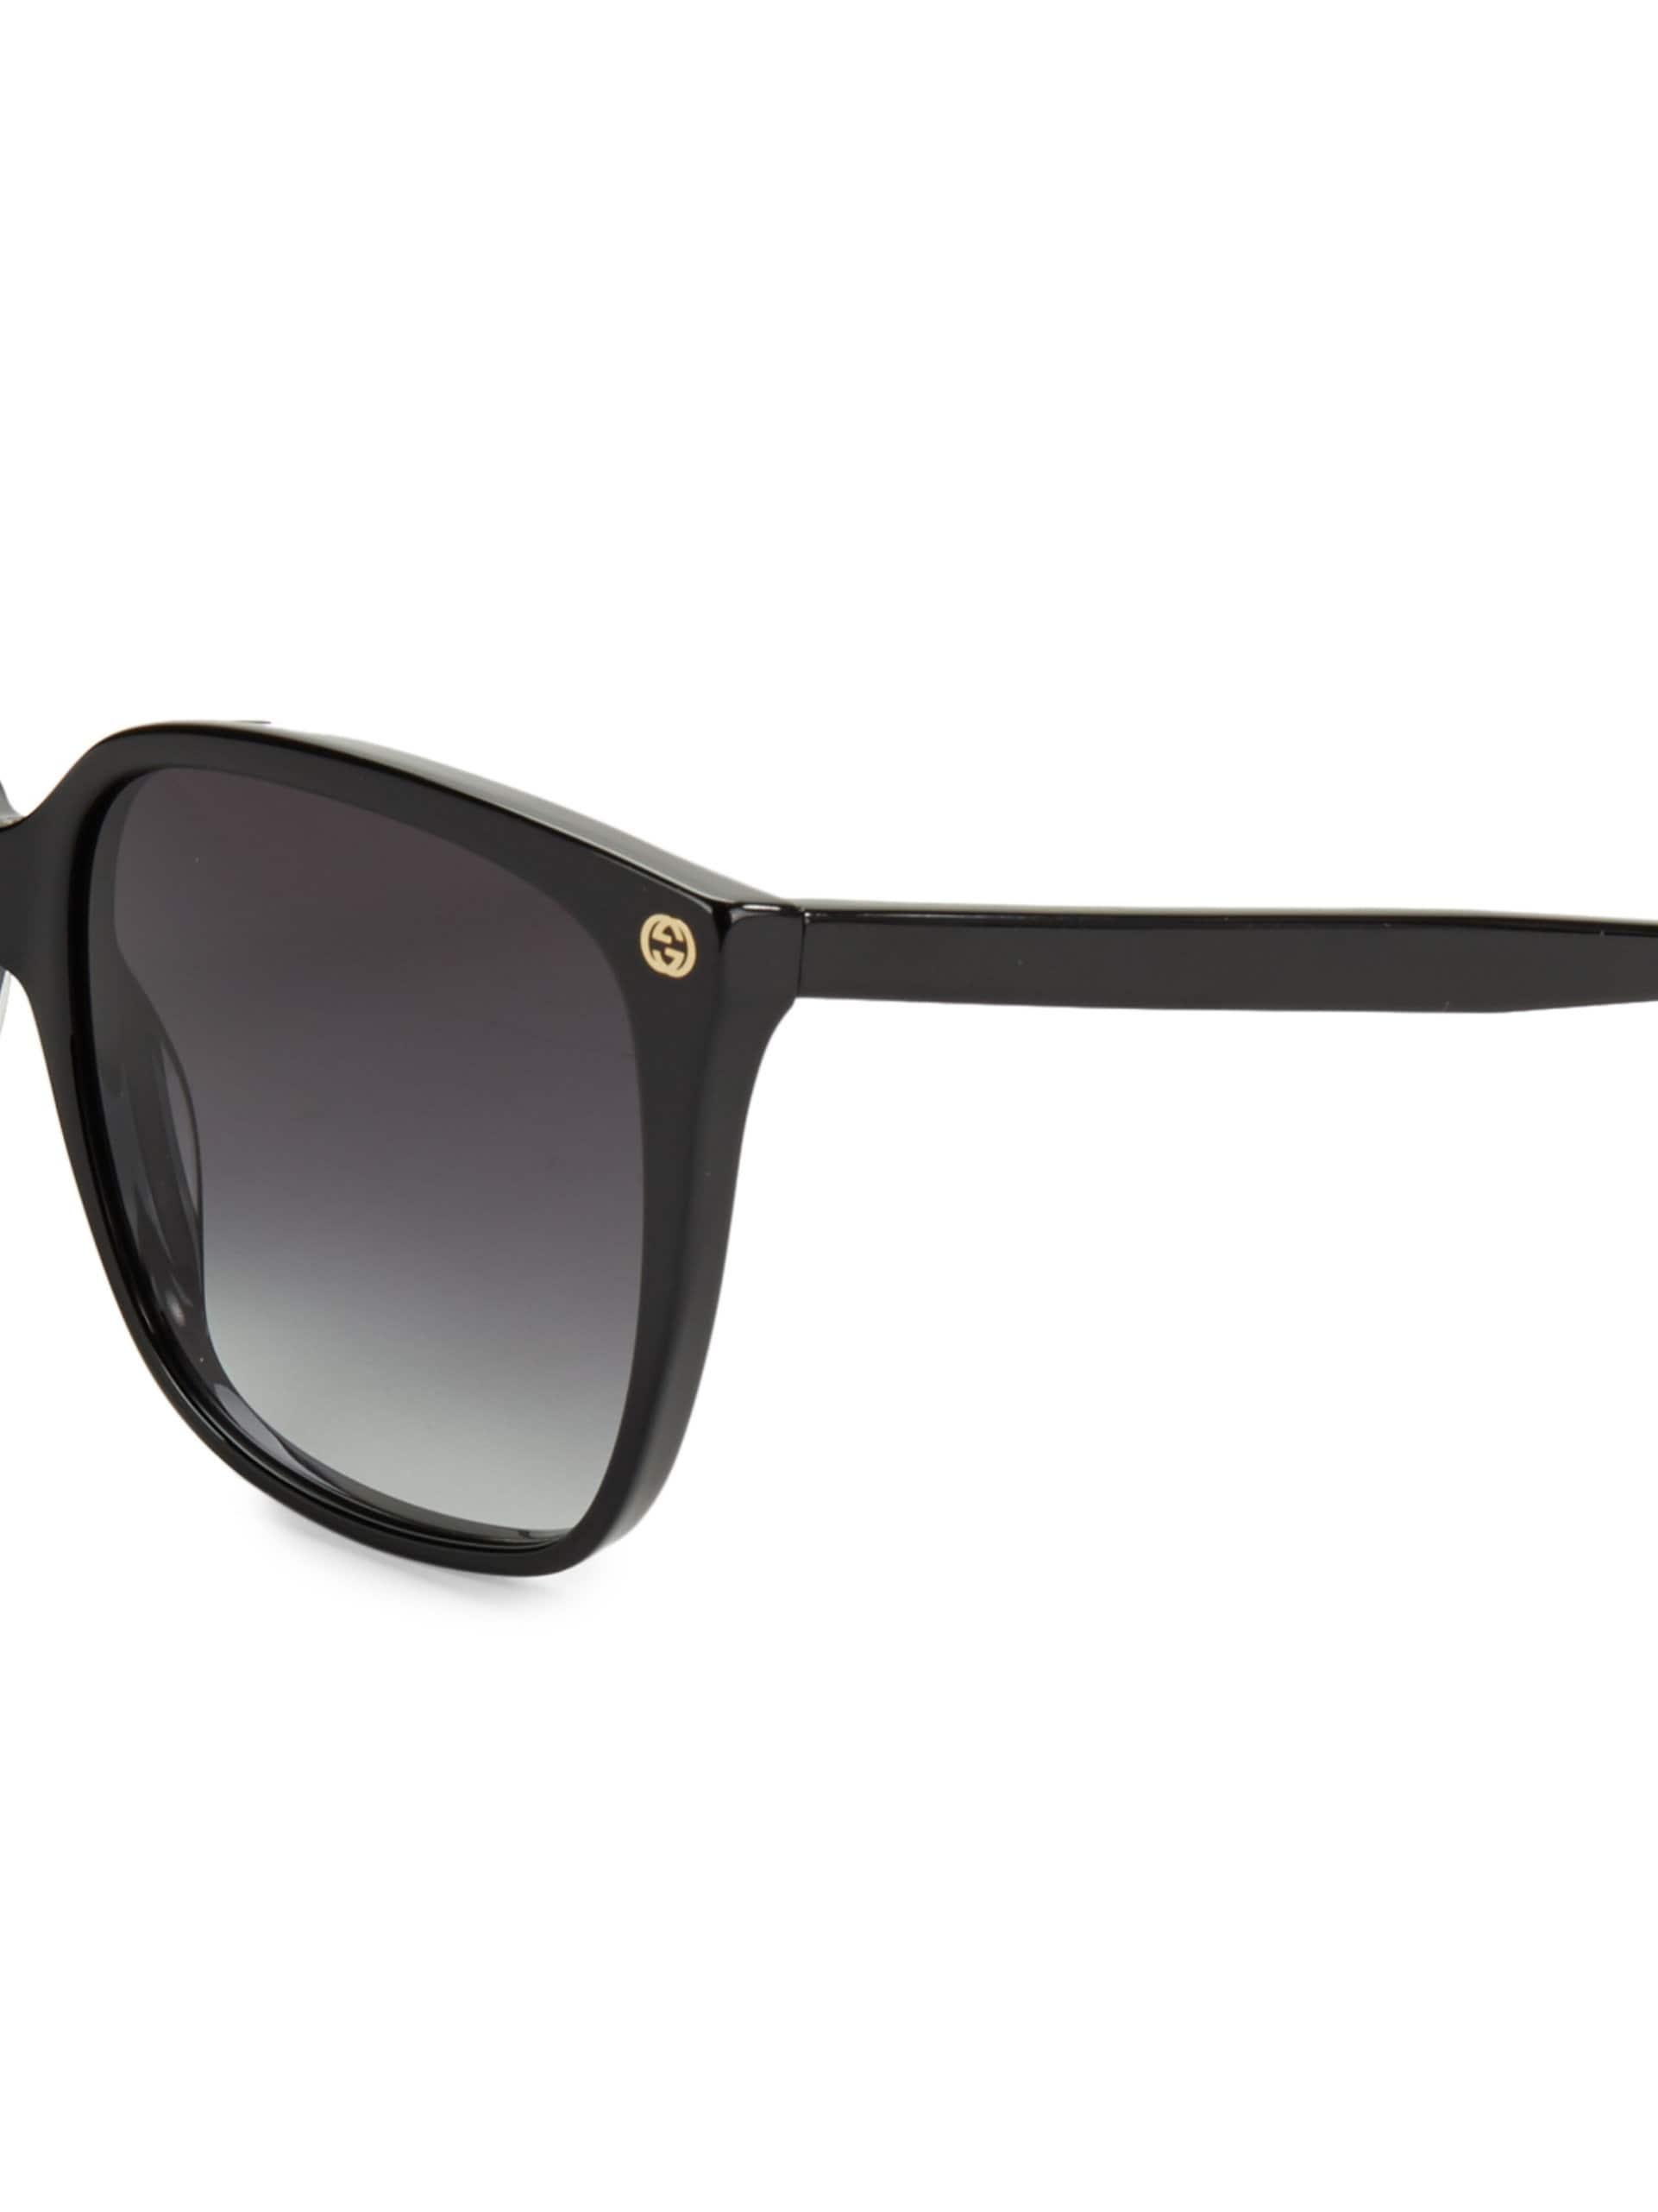 642966db9 Gucci - Women's 57mm Square Sunglasses - Black - Lyst. View fullscreen